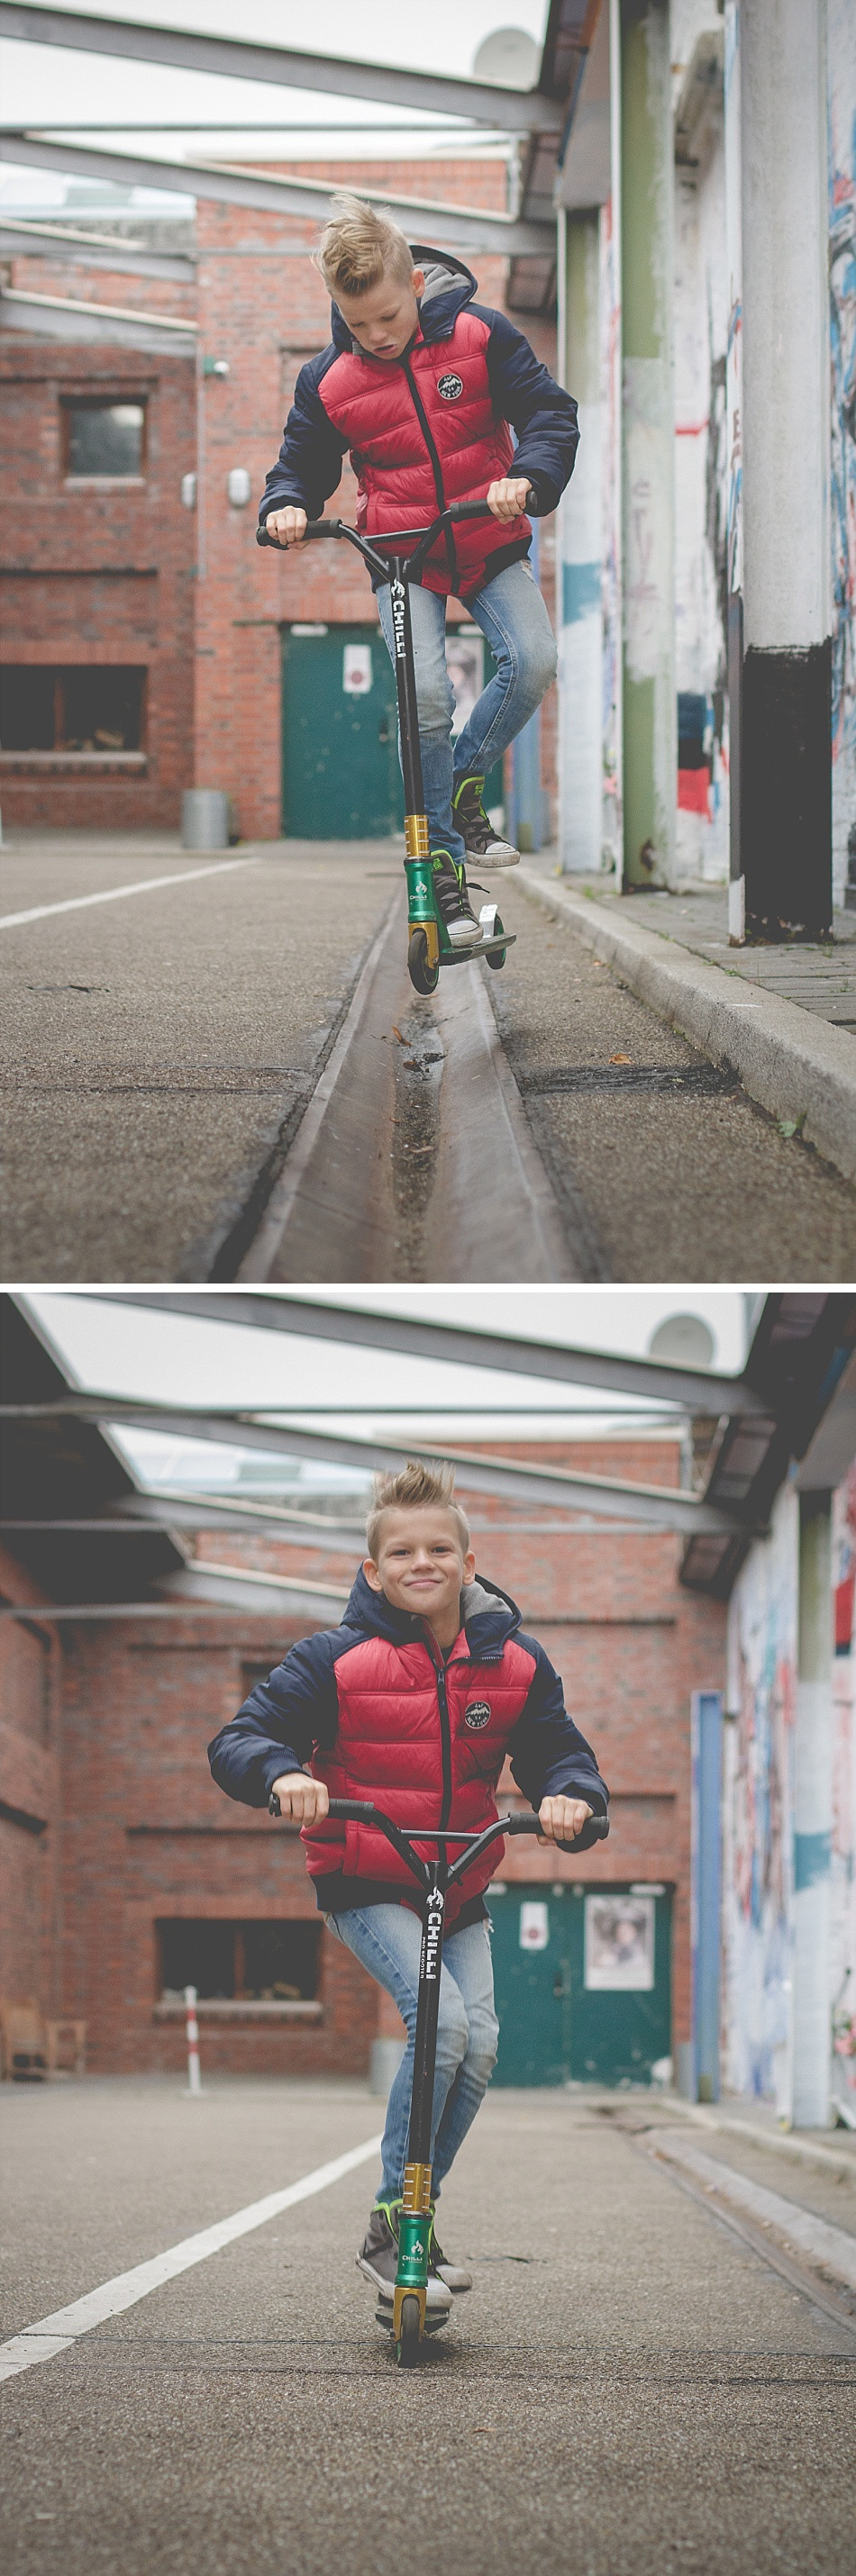 Kinderfotos mit Stunt Scooter